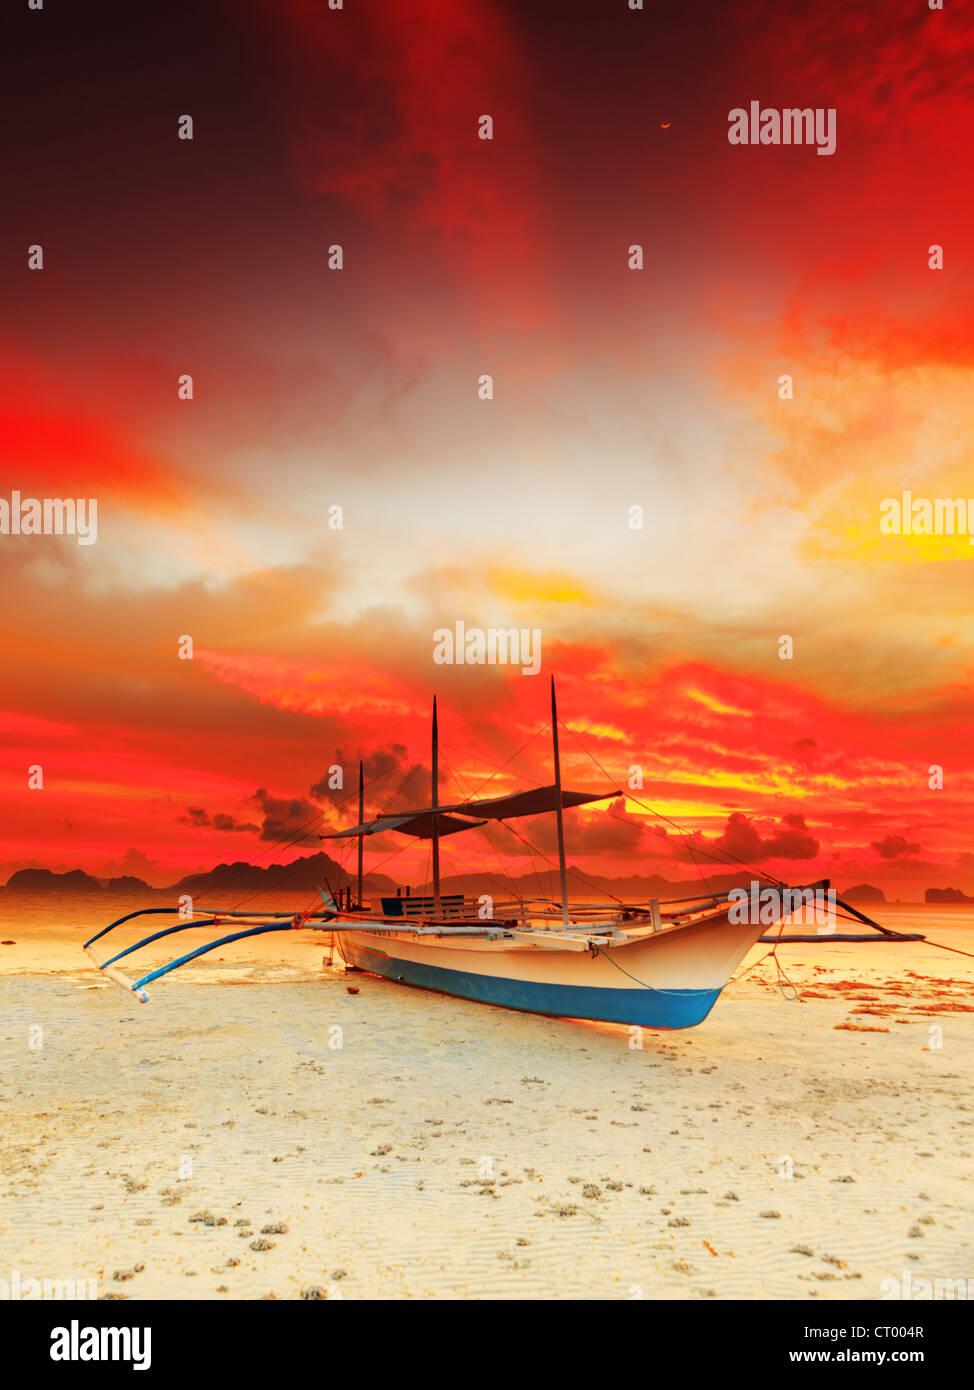 Traditionelle philippinische Boot Bangka bei Sonnenuntergang Stockbild